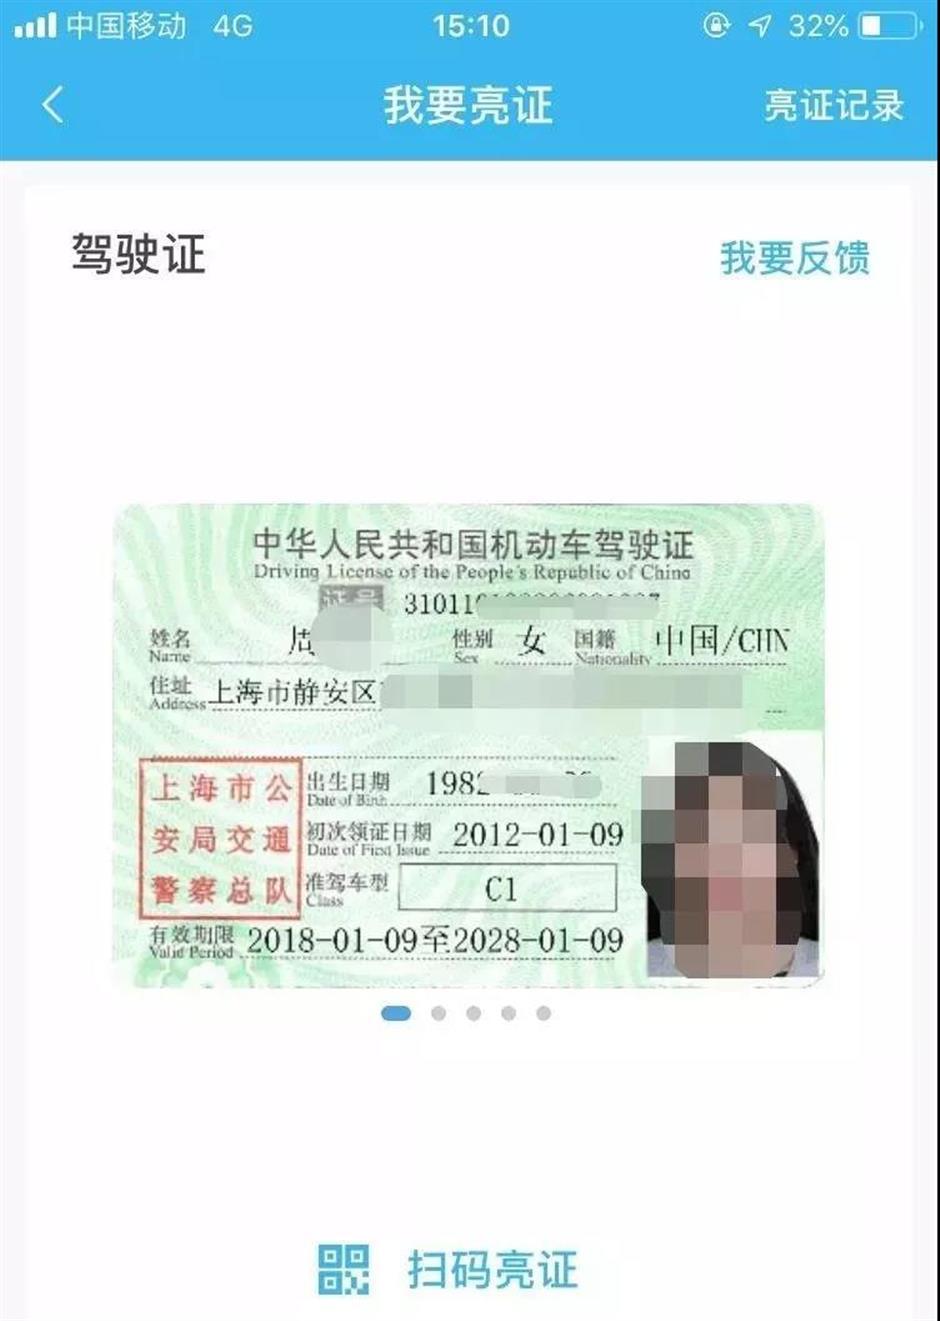 Driving licenses go digital